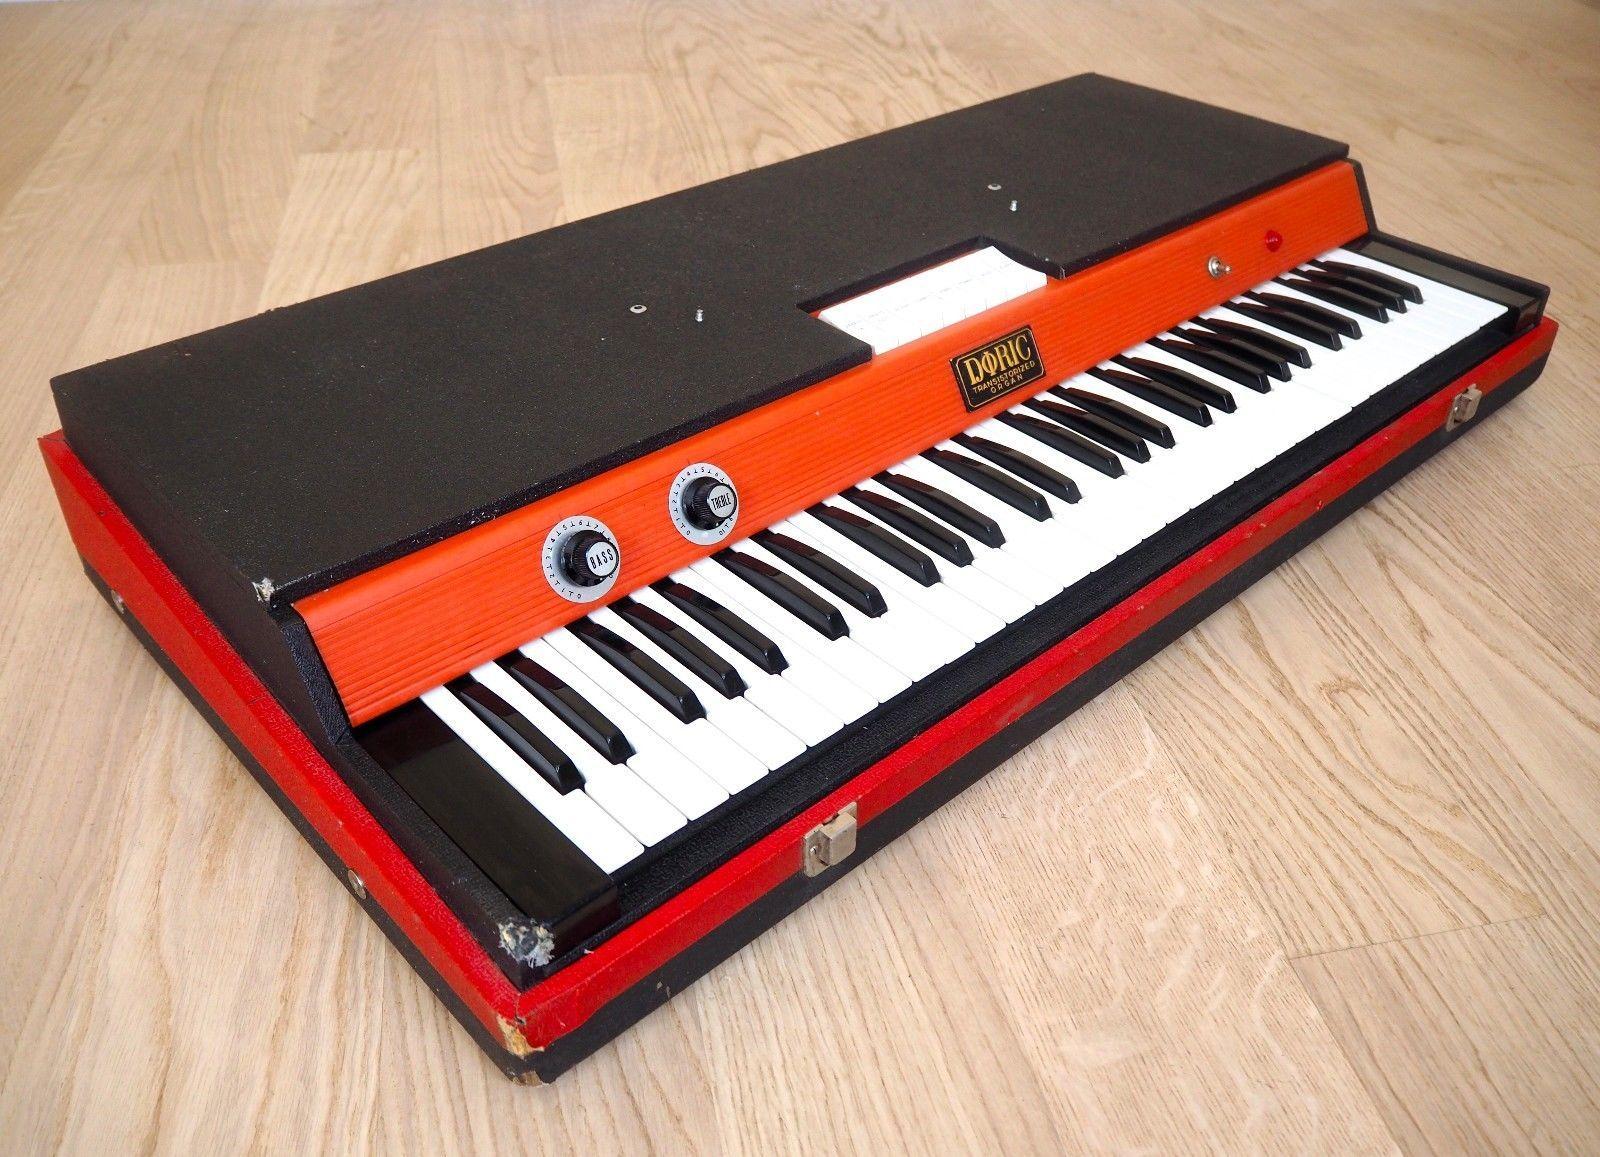 1967 Doric Cheetah Reverb Vintage Combo Organ Keyboard Italy GEM, Vox Jaguar